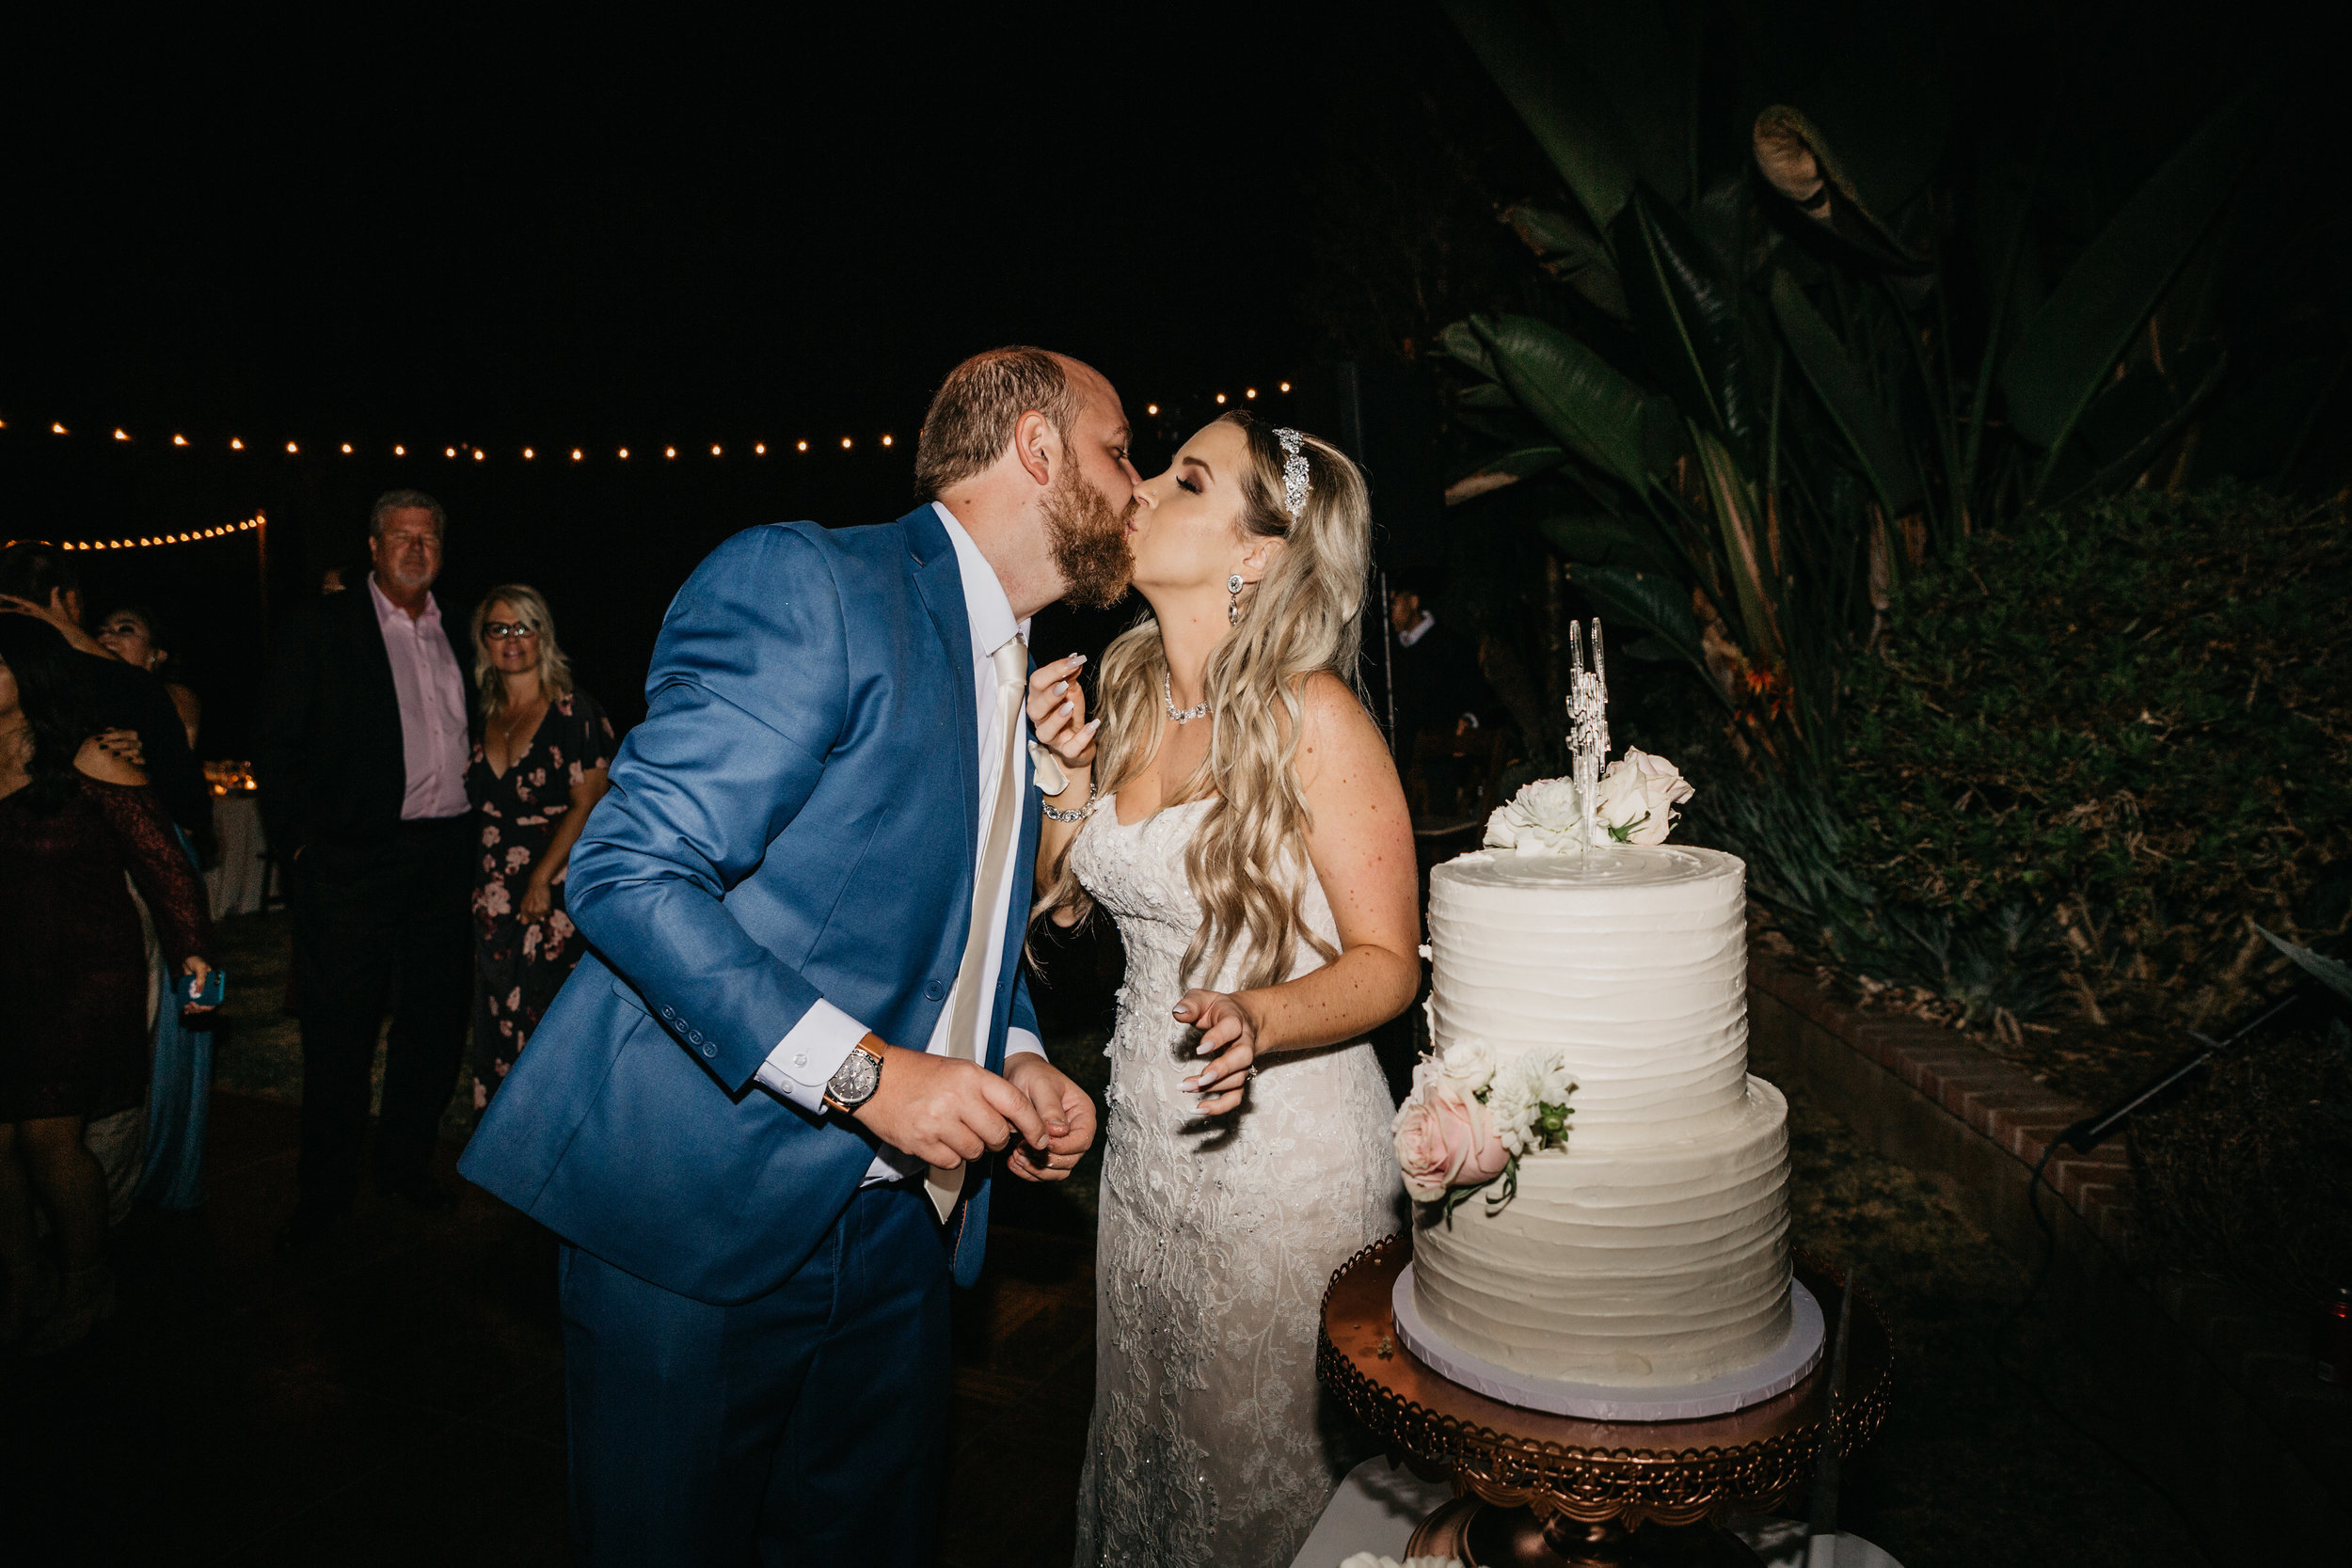 DianaLakePhoto-L+M-San-Diego-Wedding-Reception149.jpg